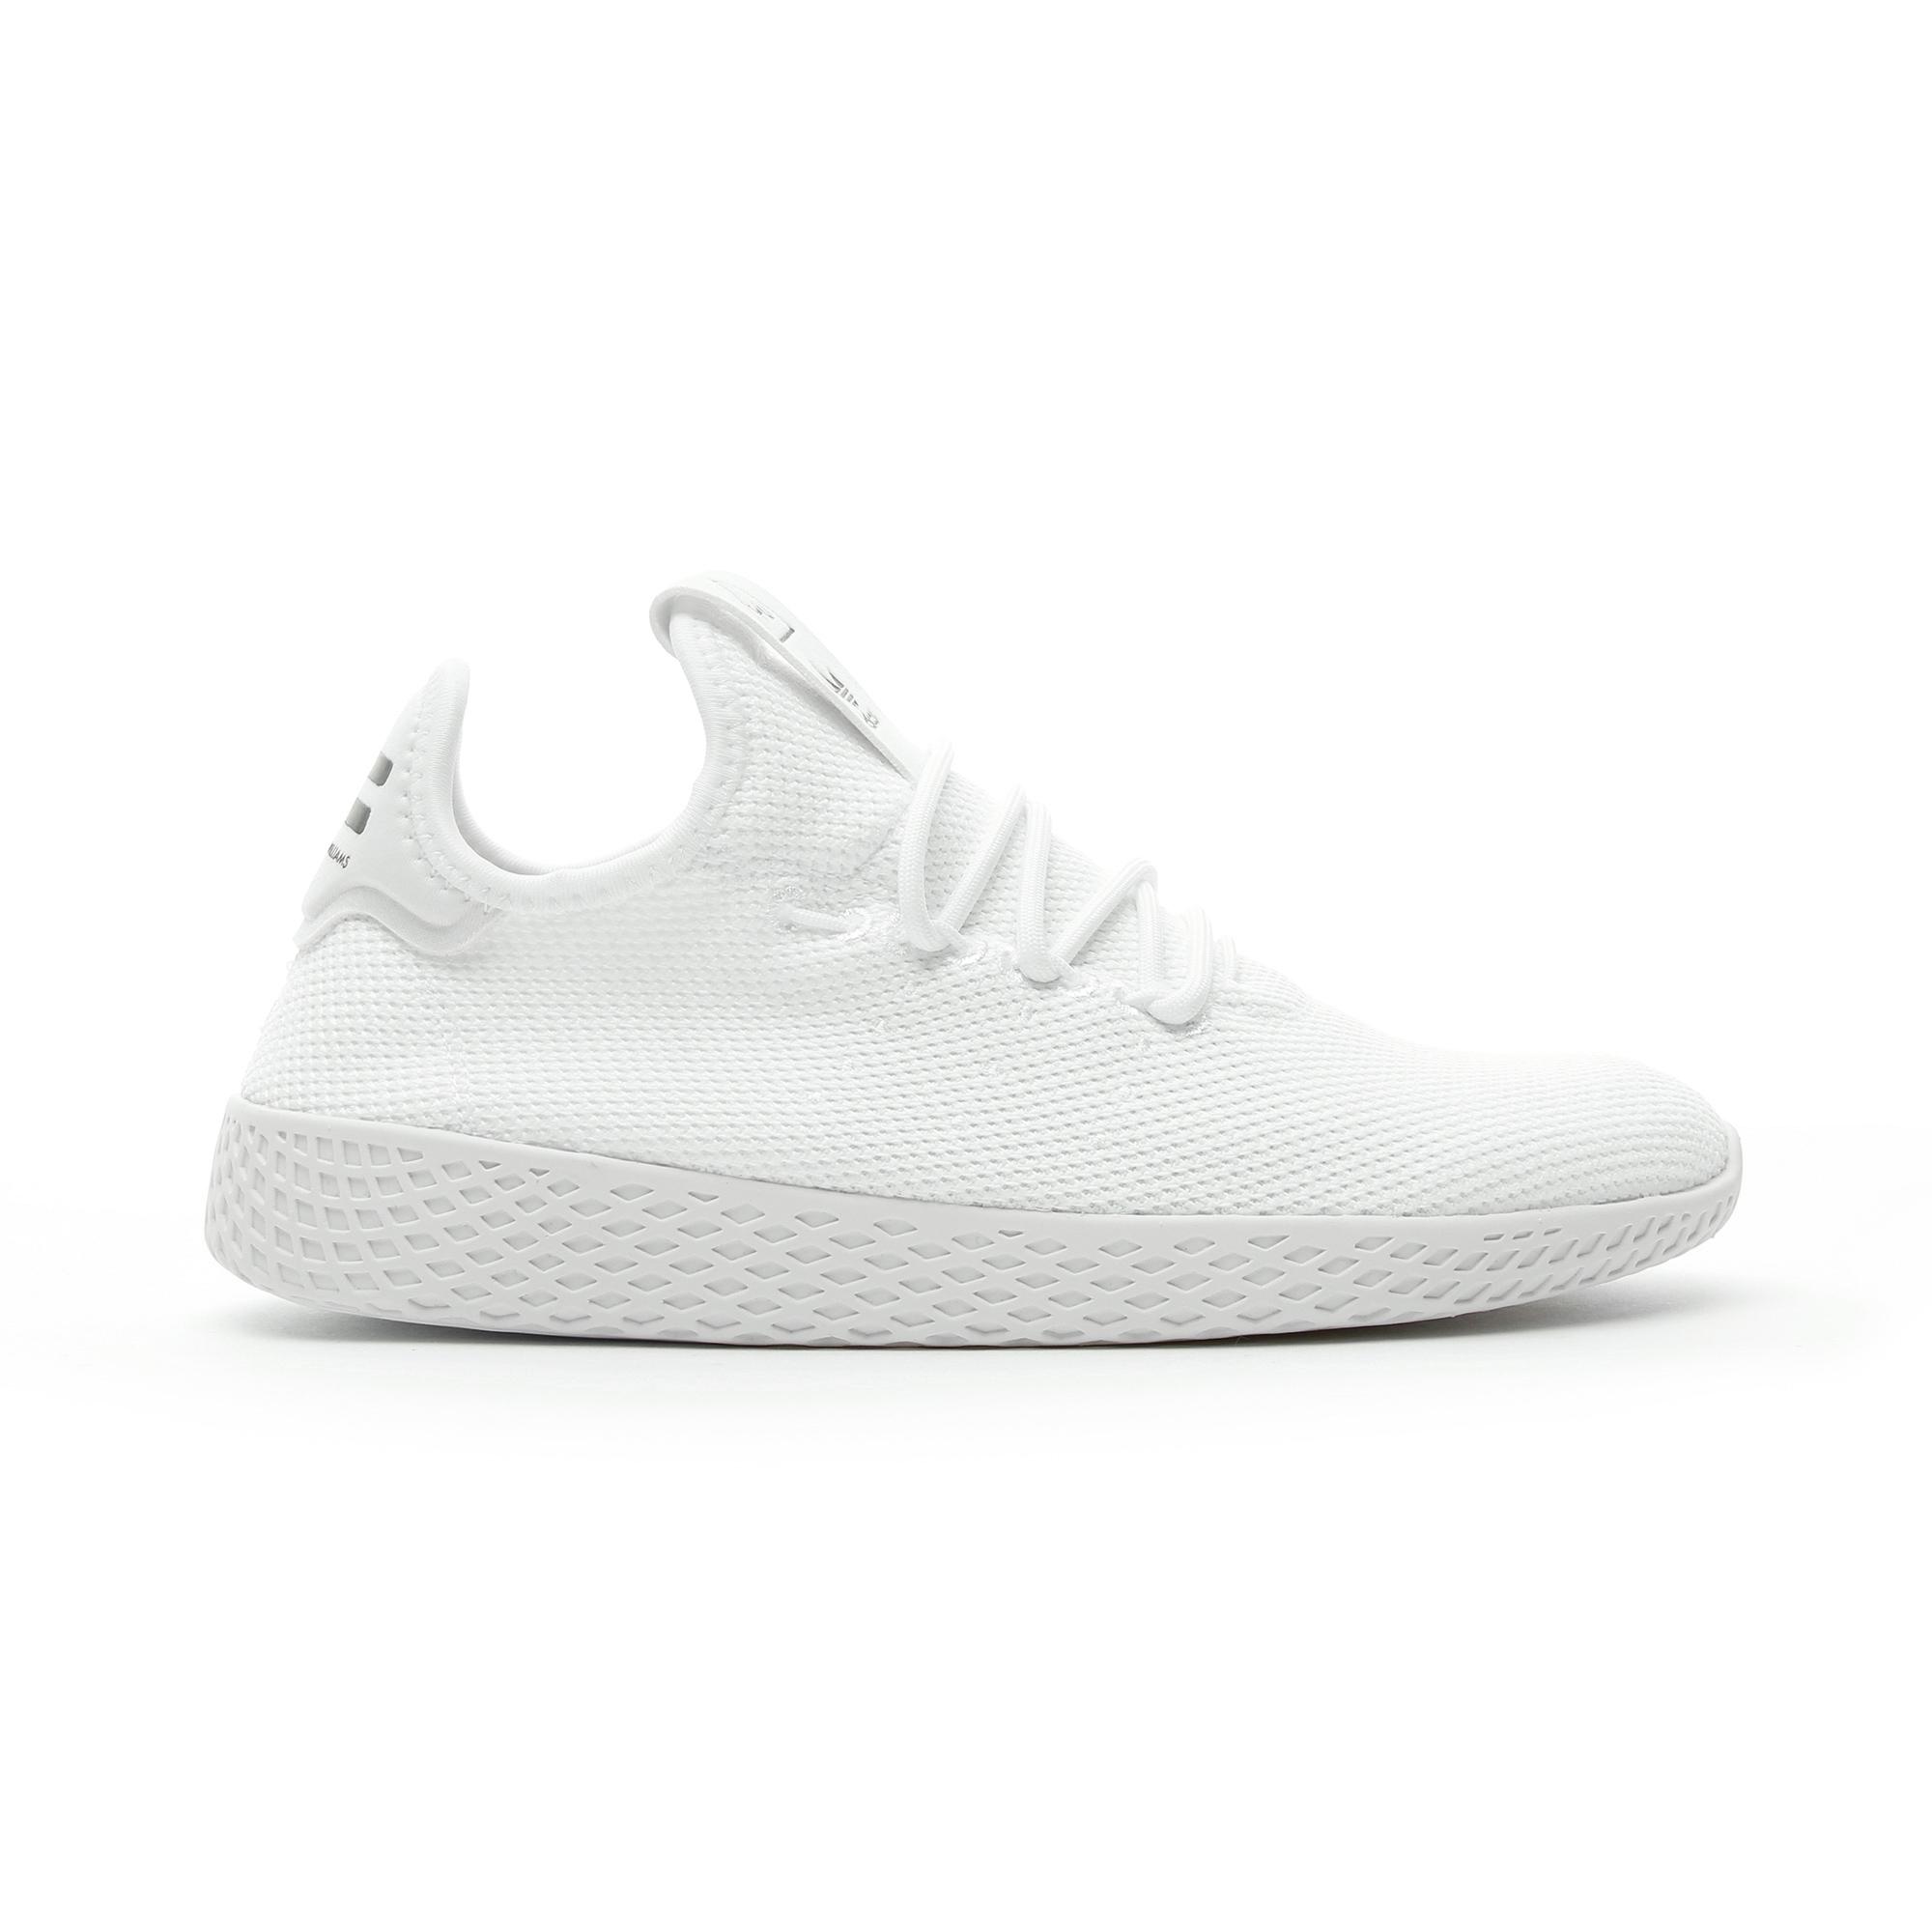 adidas Tennis Hu x Pharrell Williams Unisex Beyaz Spor Ayakkabı